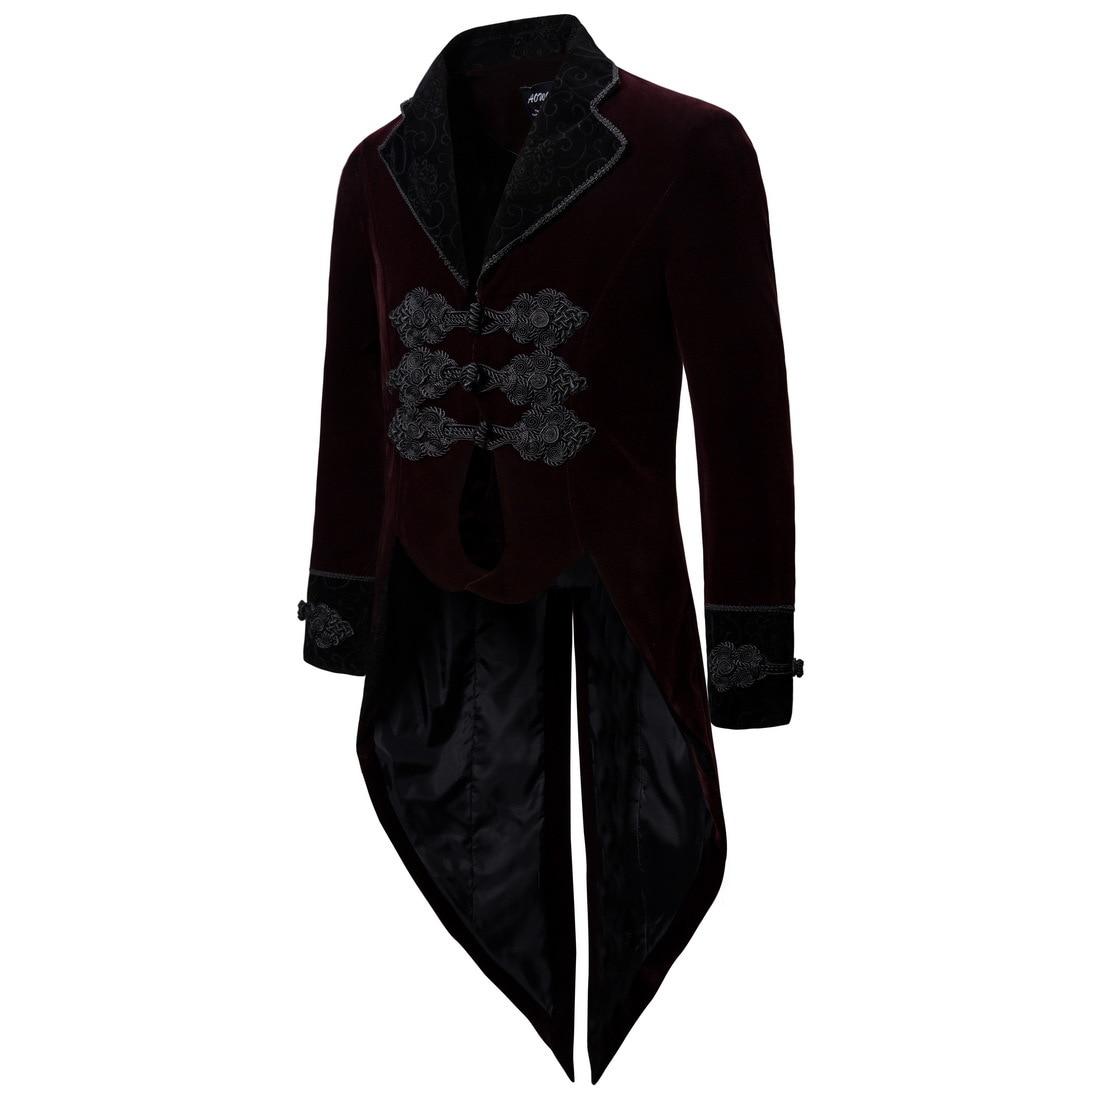 YJ032 New Fashion Autumn and Winter Clothing Men's Coat Gentleman Court Blazers